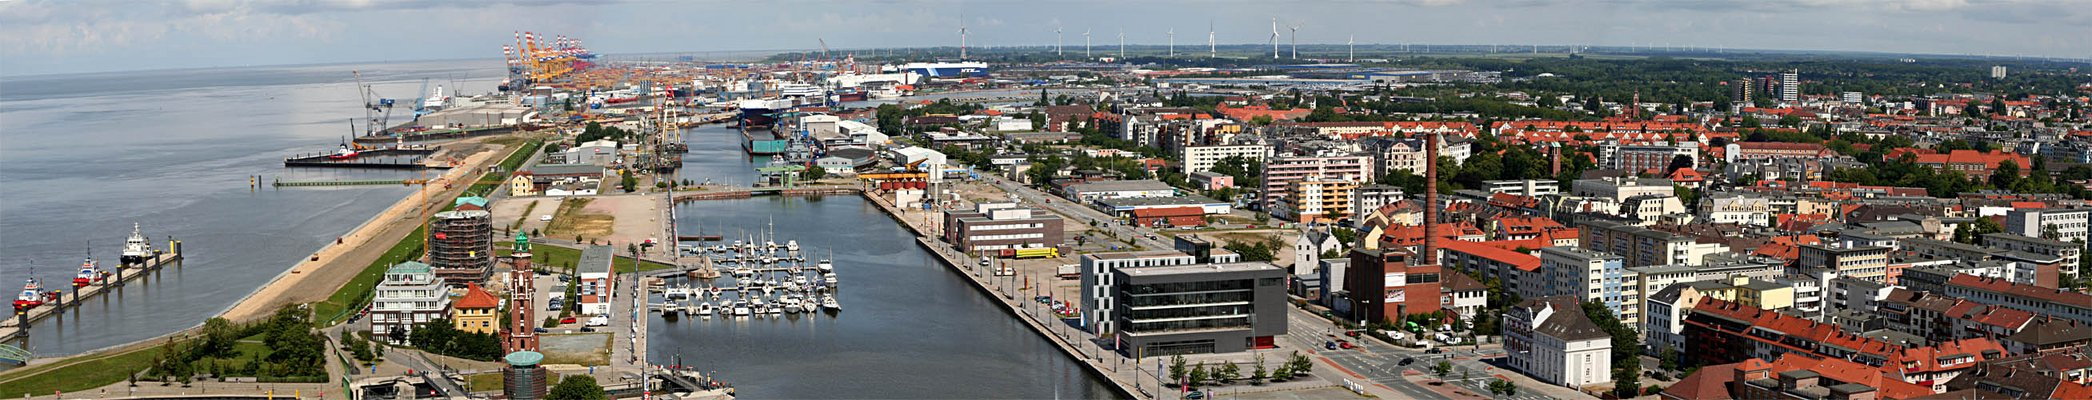 Bremerhaven - Panorama